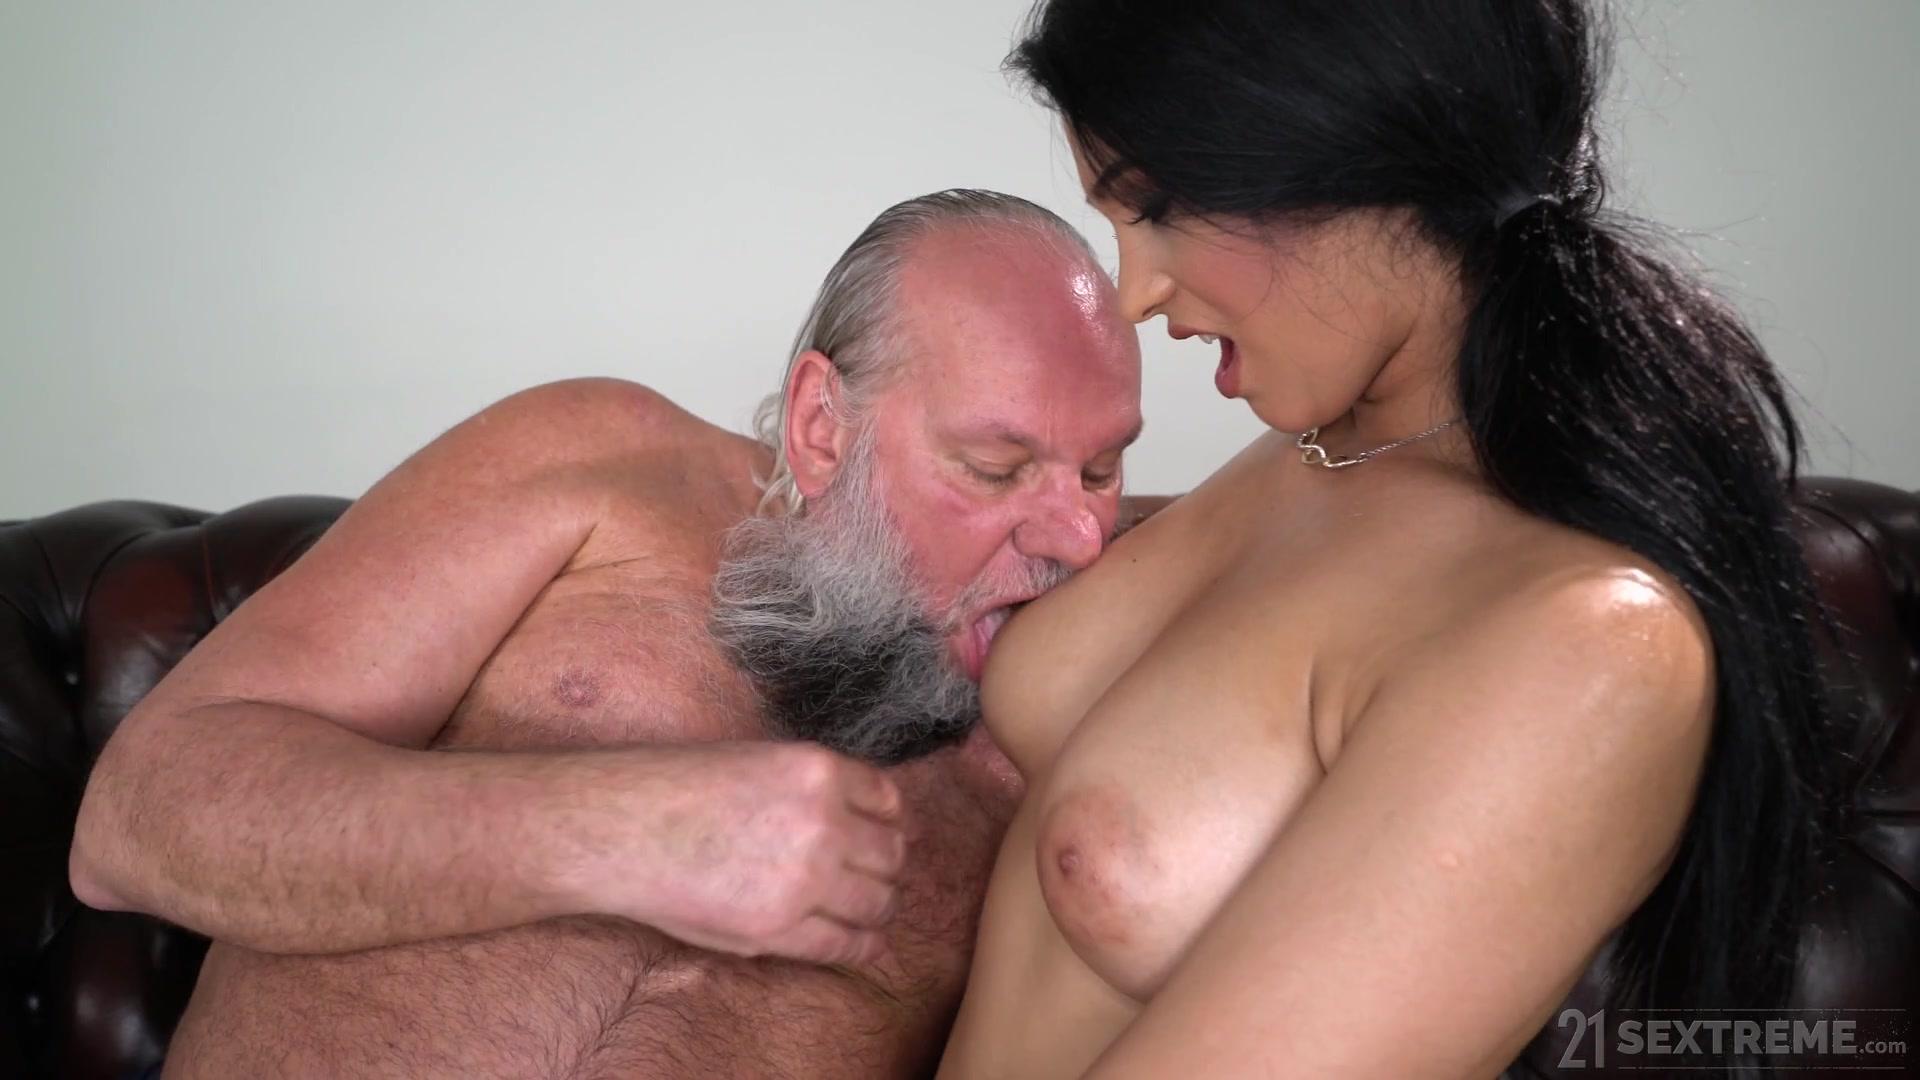 21 Sextreme Porno Net busty young ava black hard fuckeda senior man - hell porno